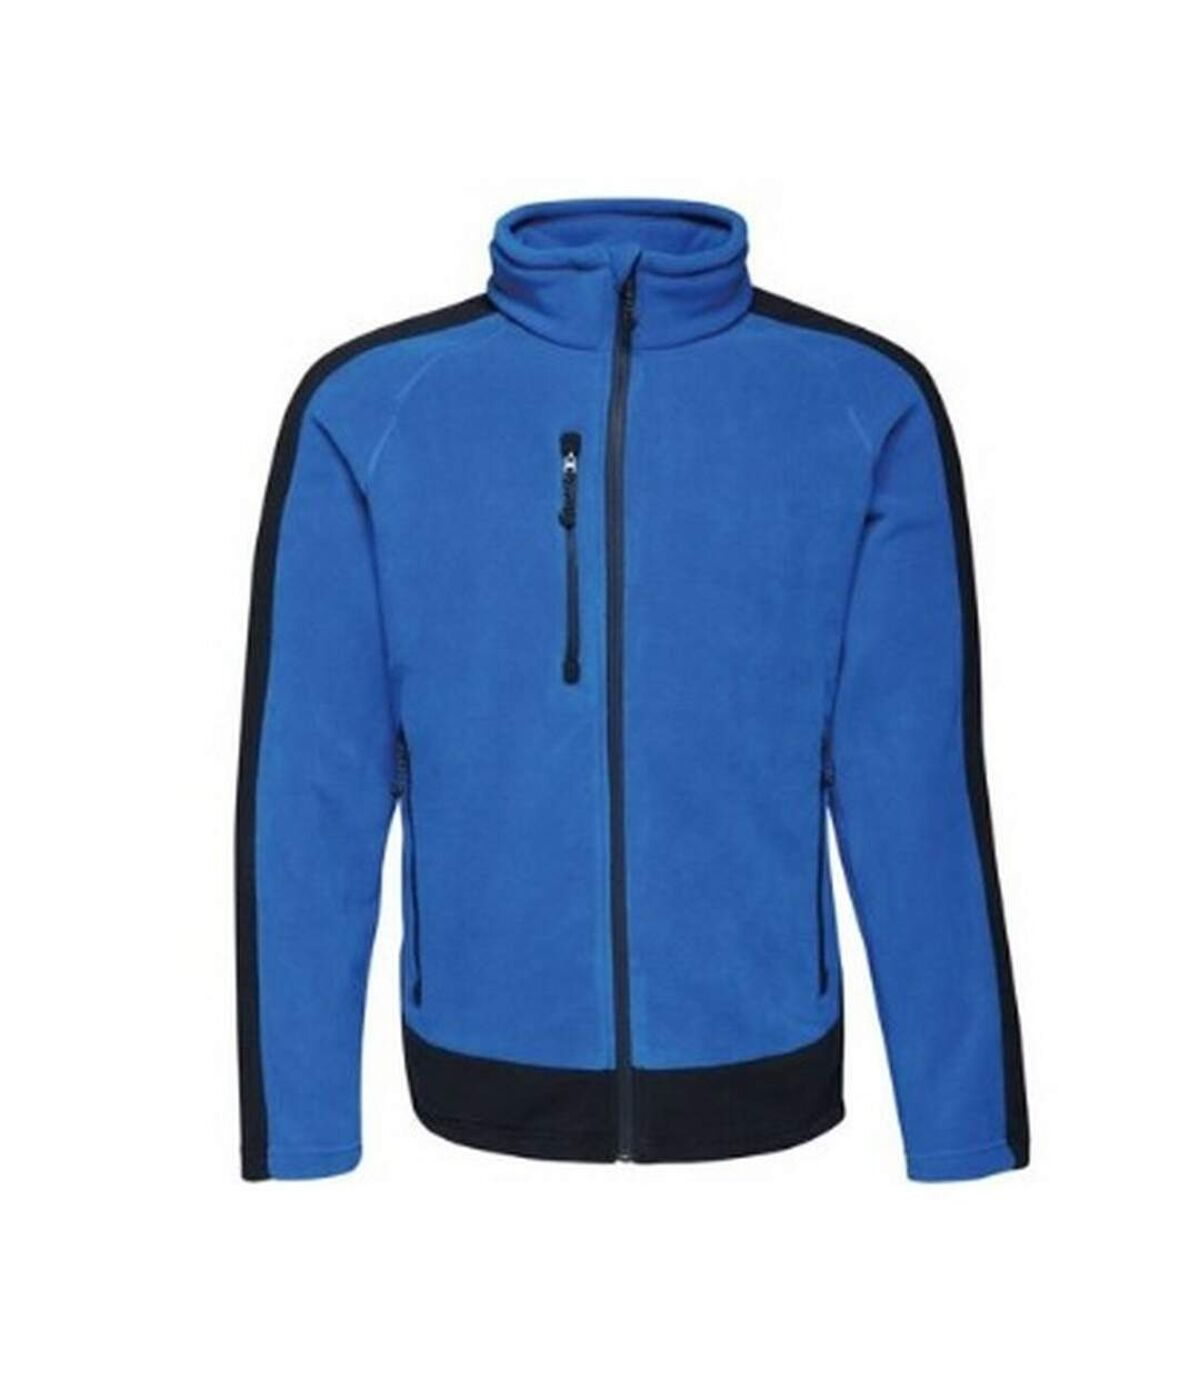 Regatta - Veste polaire CONTRAST - Homme (Bleu roi/ Bleu marine) - UTRG3568